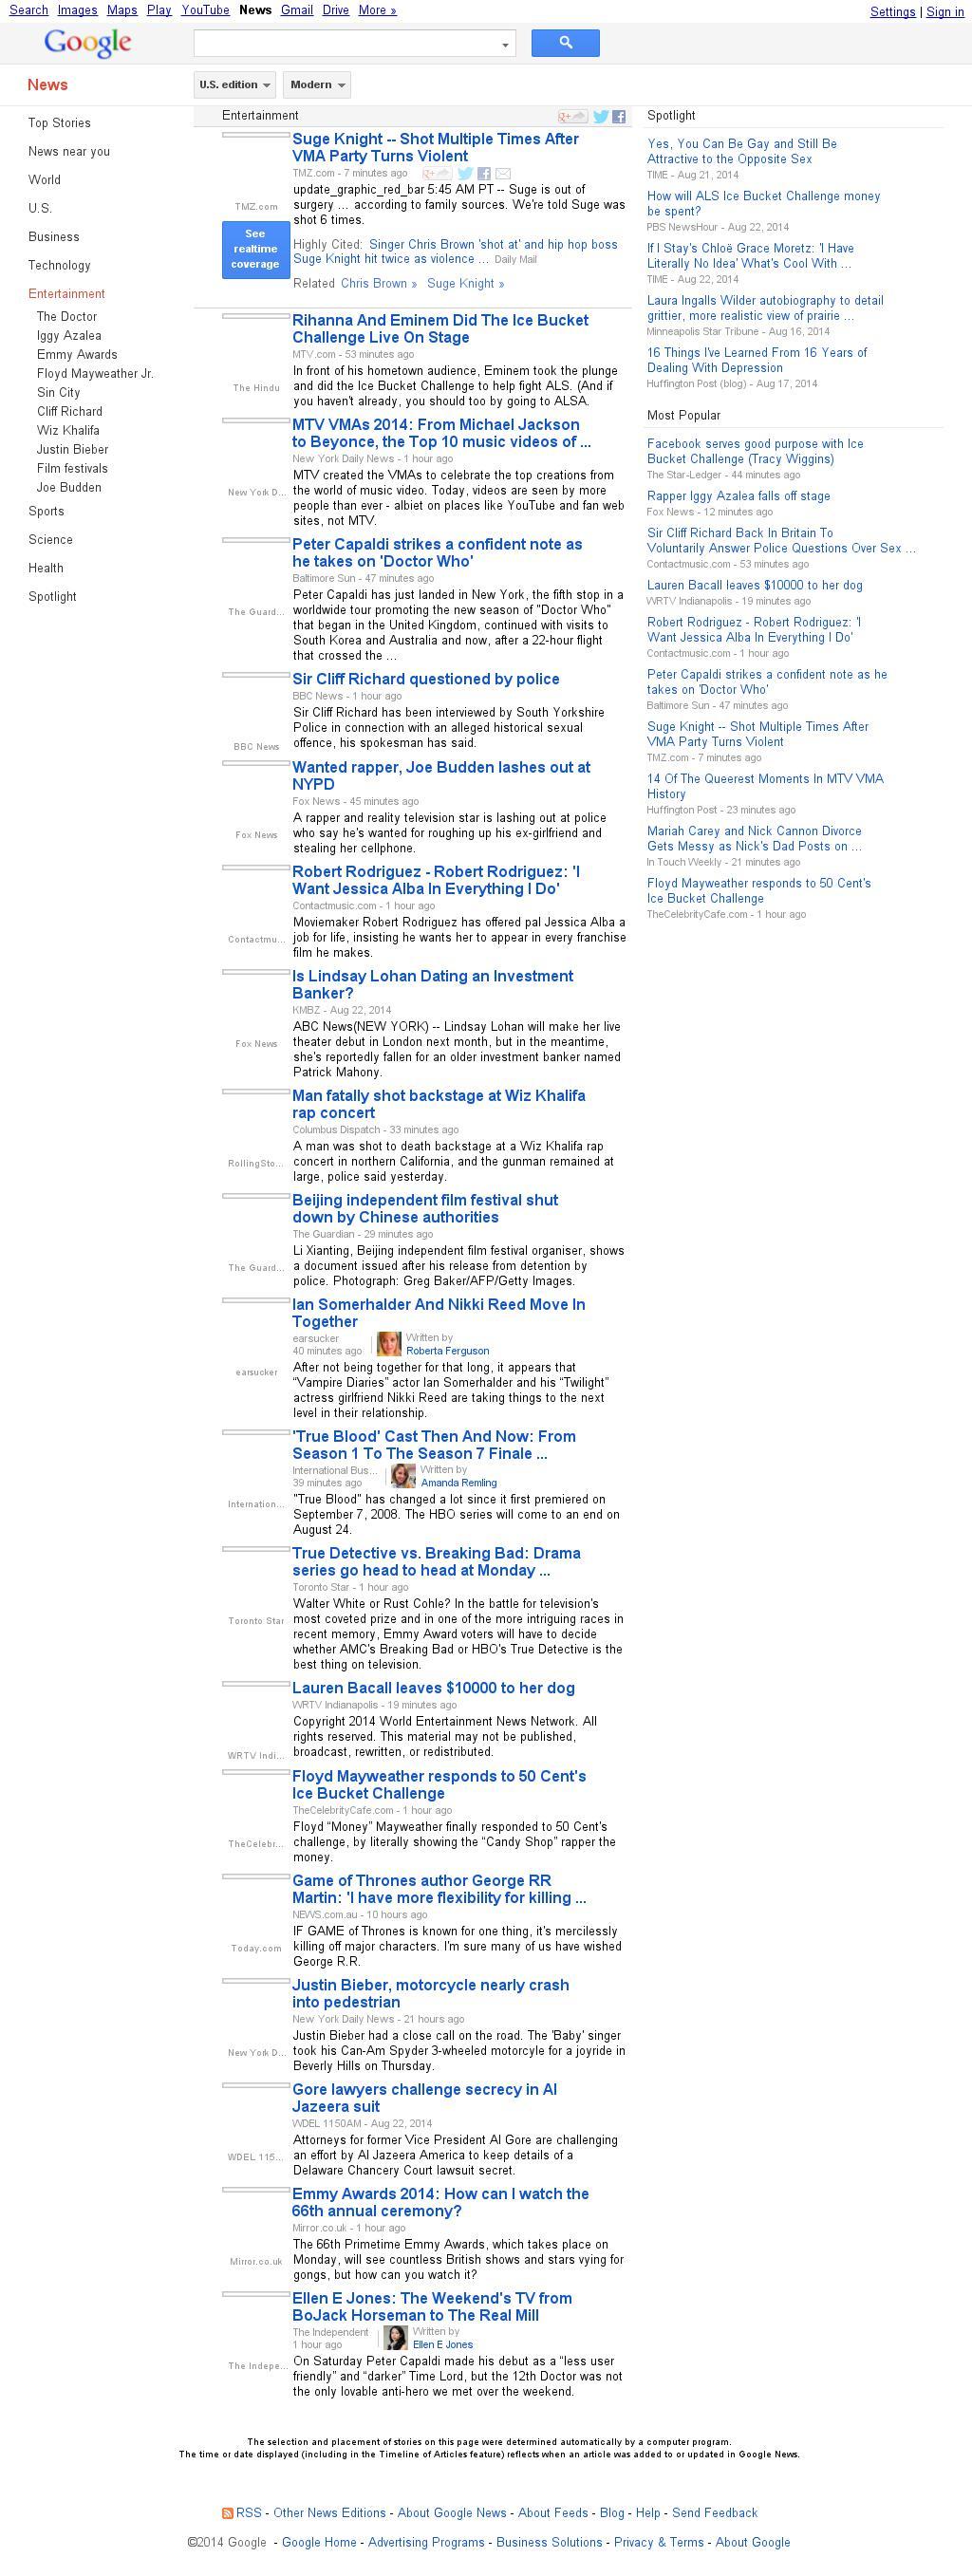 Google News: Entertainment at Sunday Aug. 24, 2014, 2:08 p.m. UTC